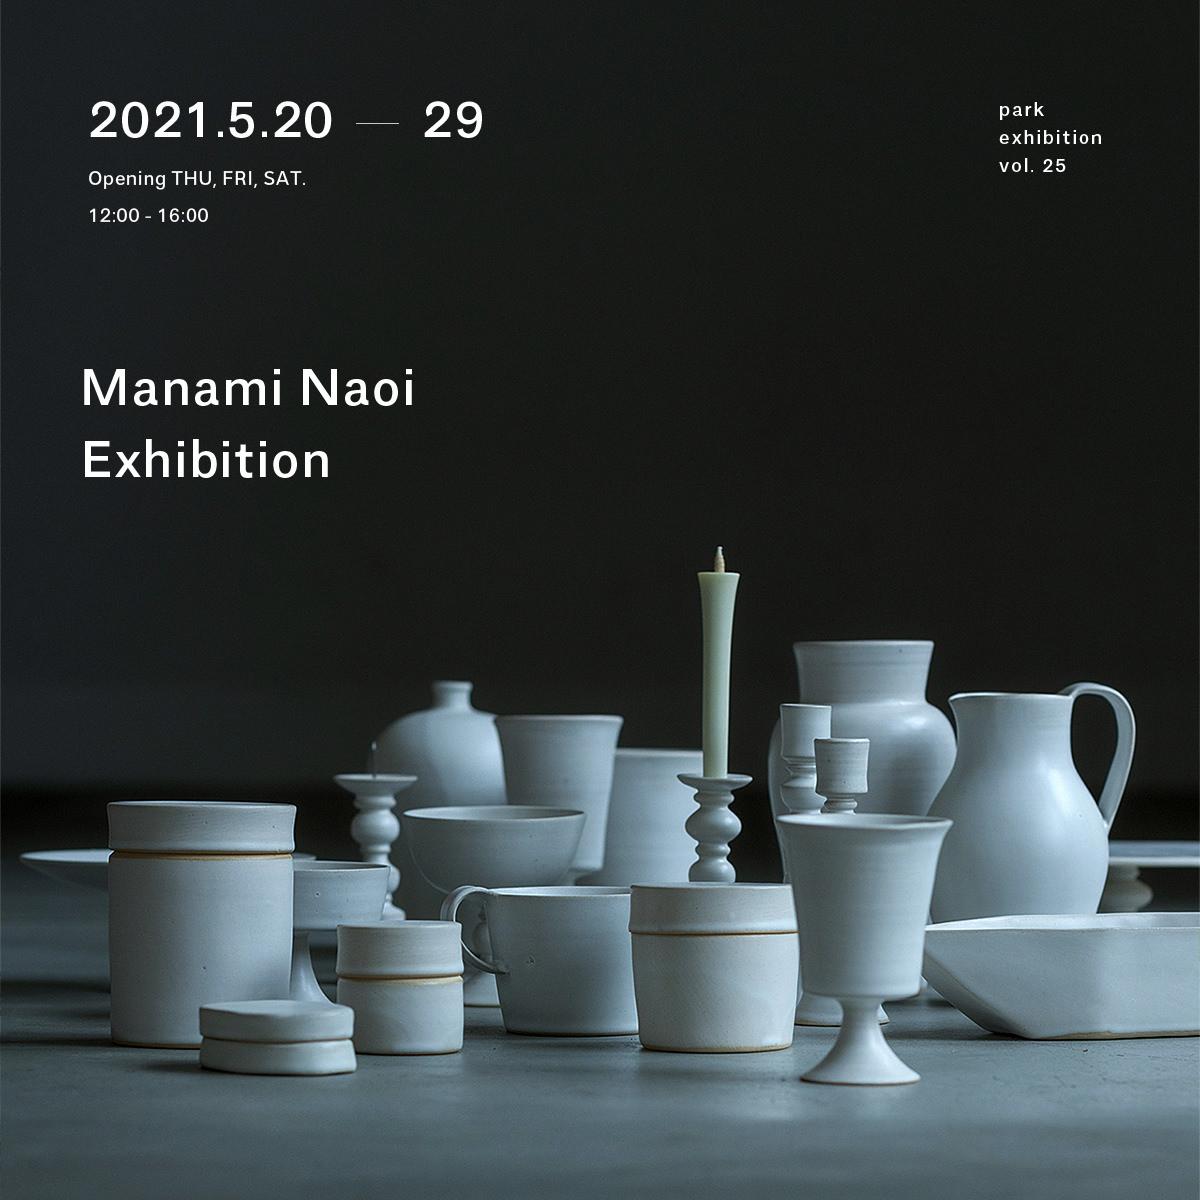 Manami Naoi Exhibition 開催のお知らせ